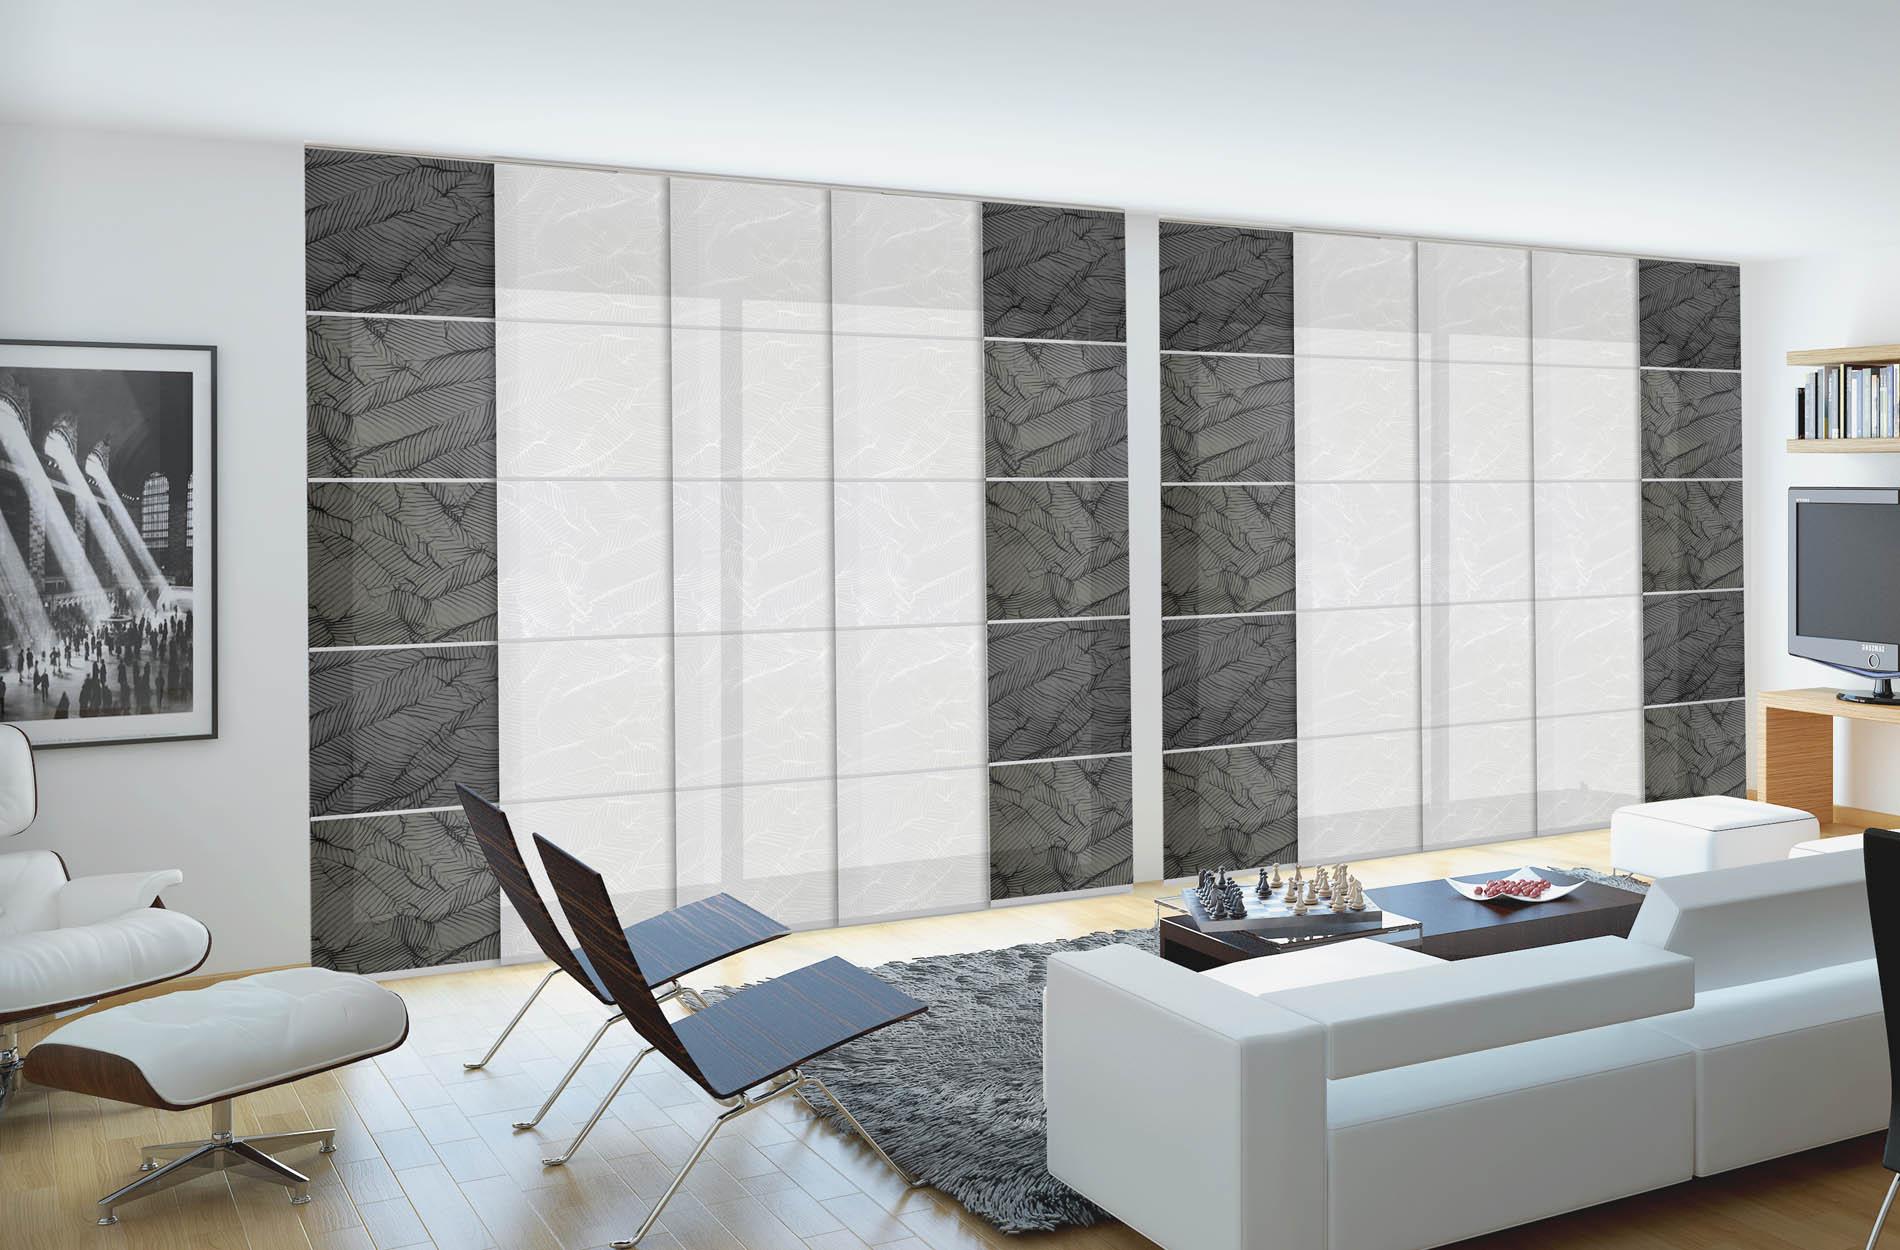 Paneles japoneses papyrus en zaragoza - Riel panel japones ikea ...